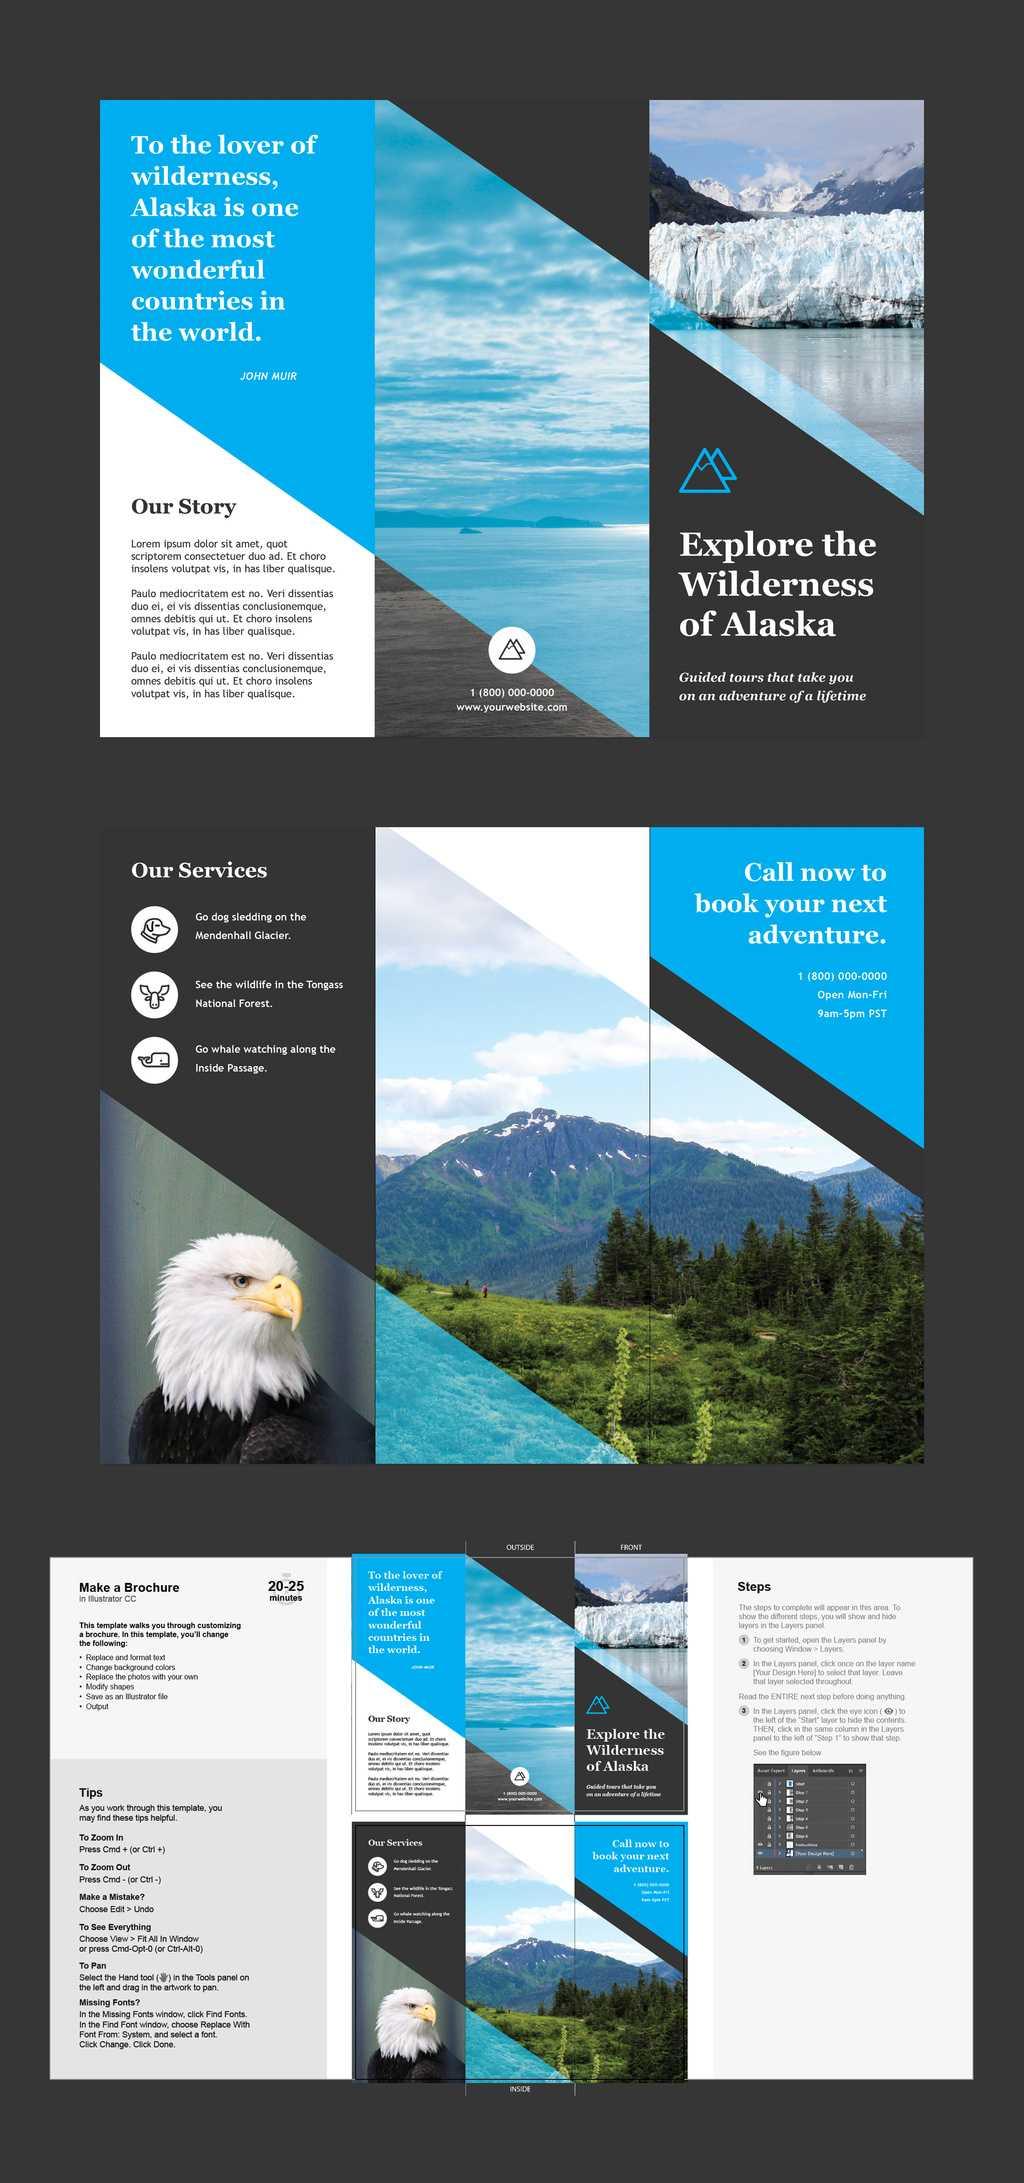 Professional Brochure Templates | Adobe Blog Inside Adobe Illustrator Brochure Templates Free Download